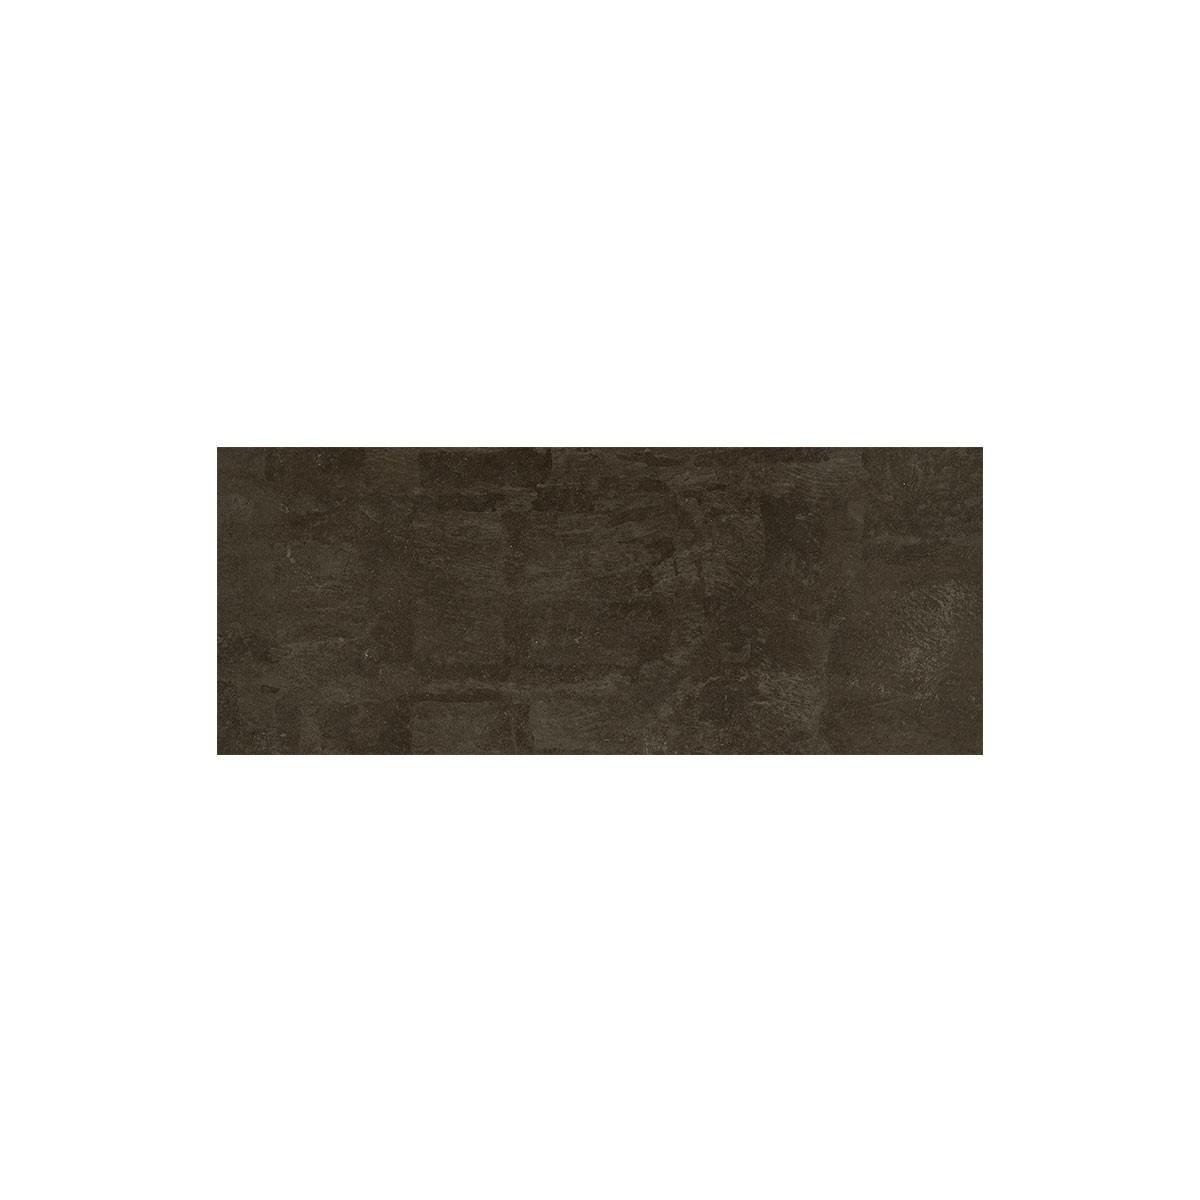 DECORAPORT NWS Wall Panel, Aged Grey, 3.97'' x7.85'' (NAG-01) (Sample)